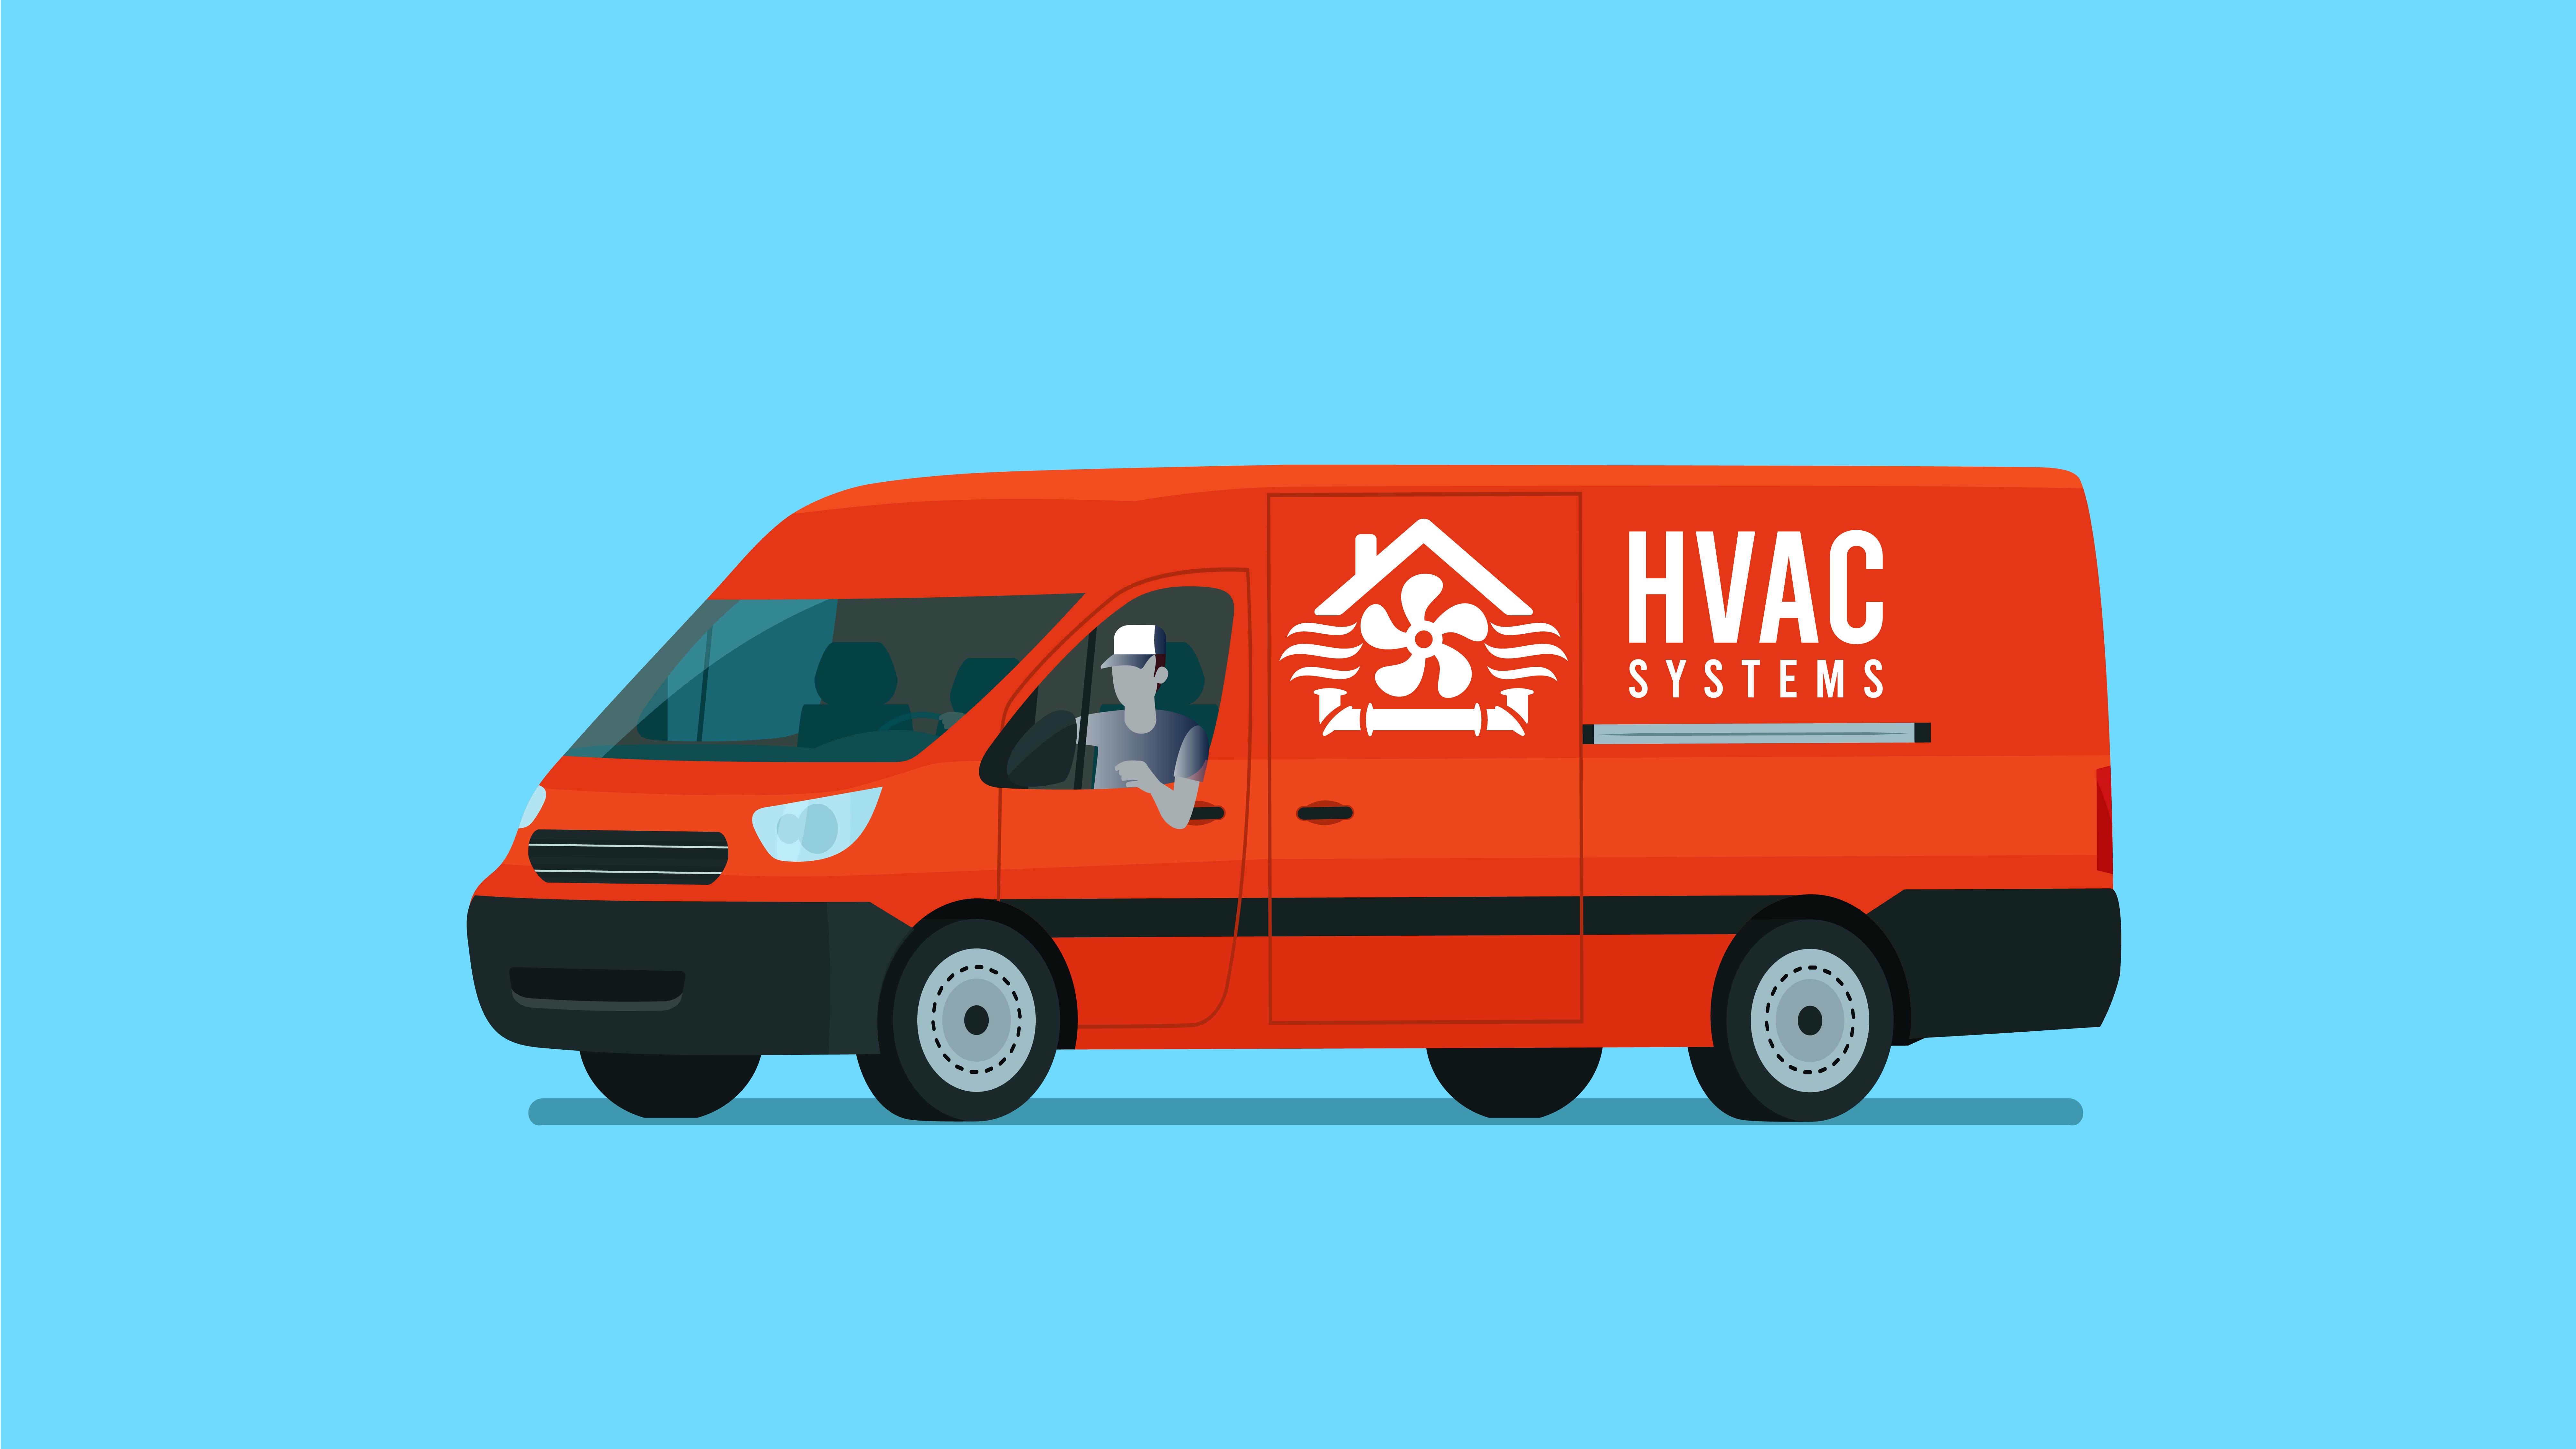 Illustration of an HVAC van.